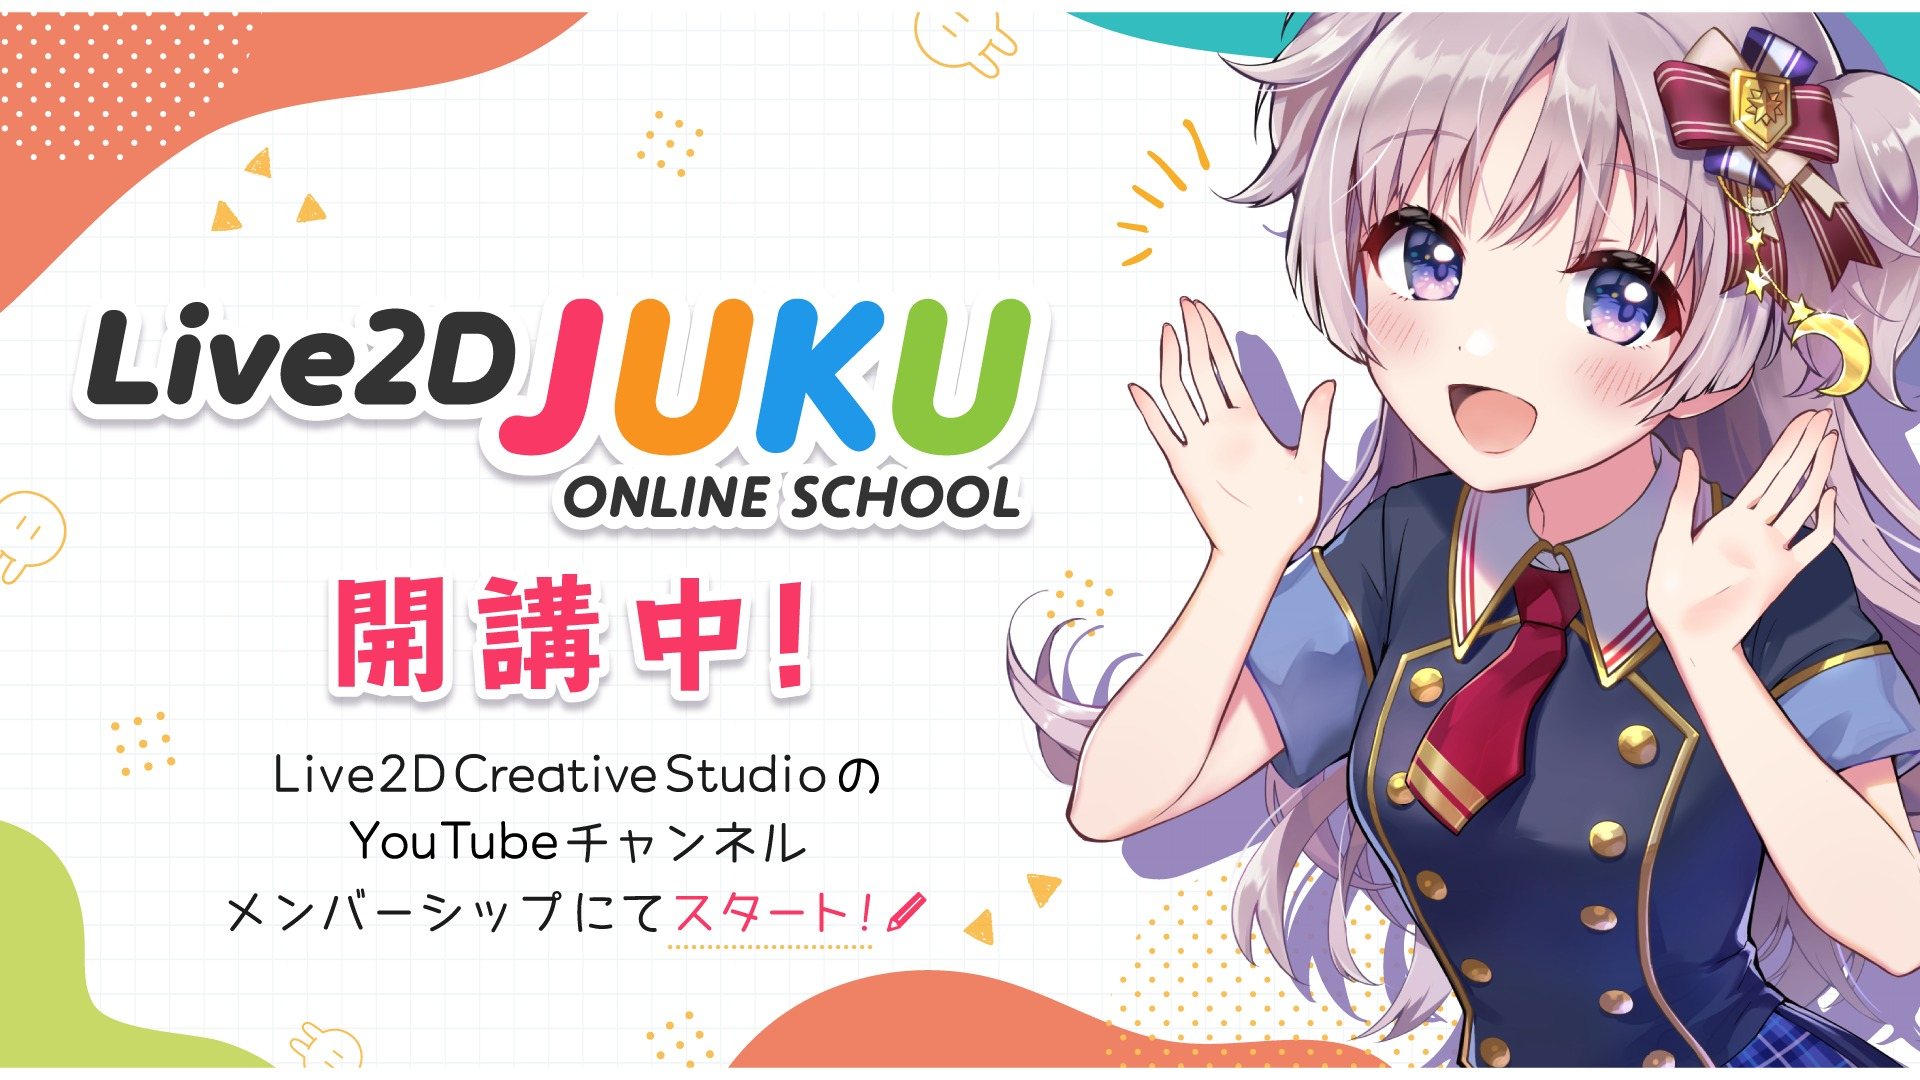 「Live2D JUKU」を本日開講いたしました。